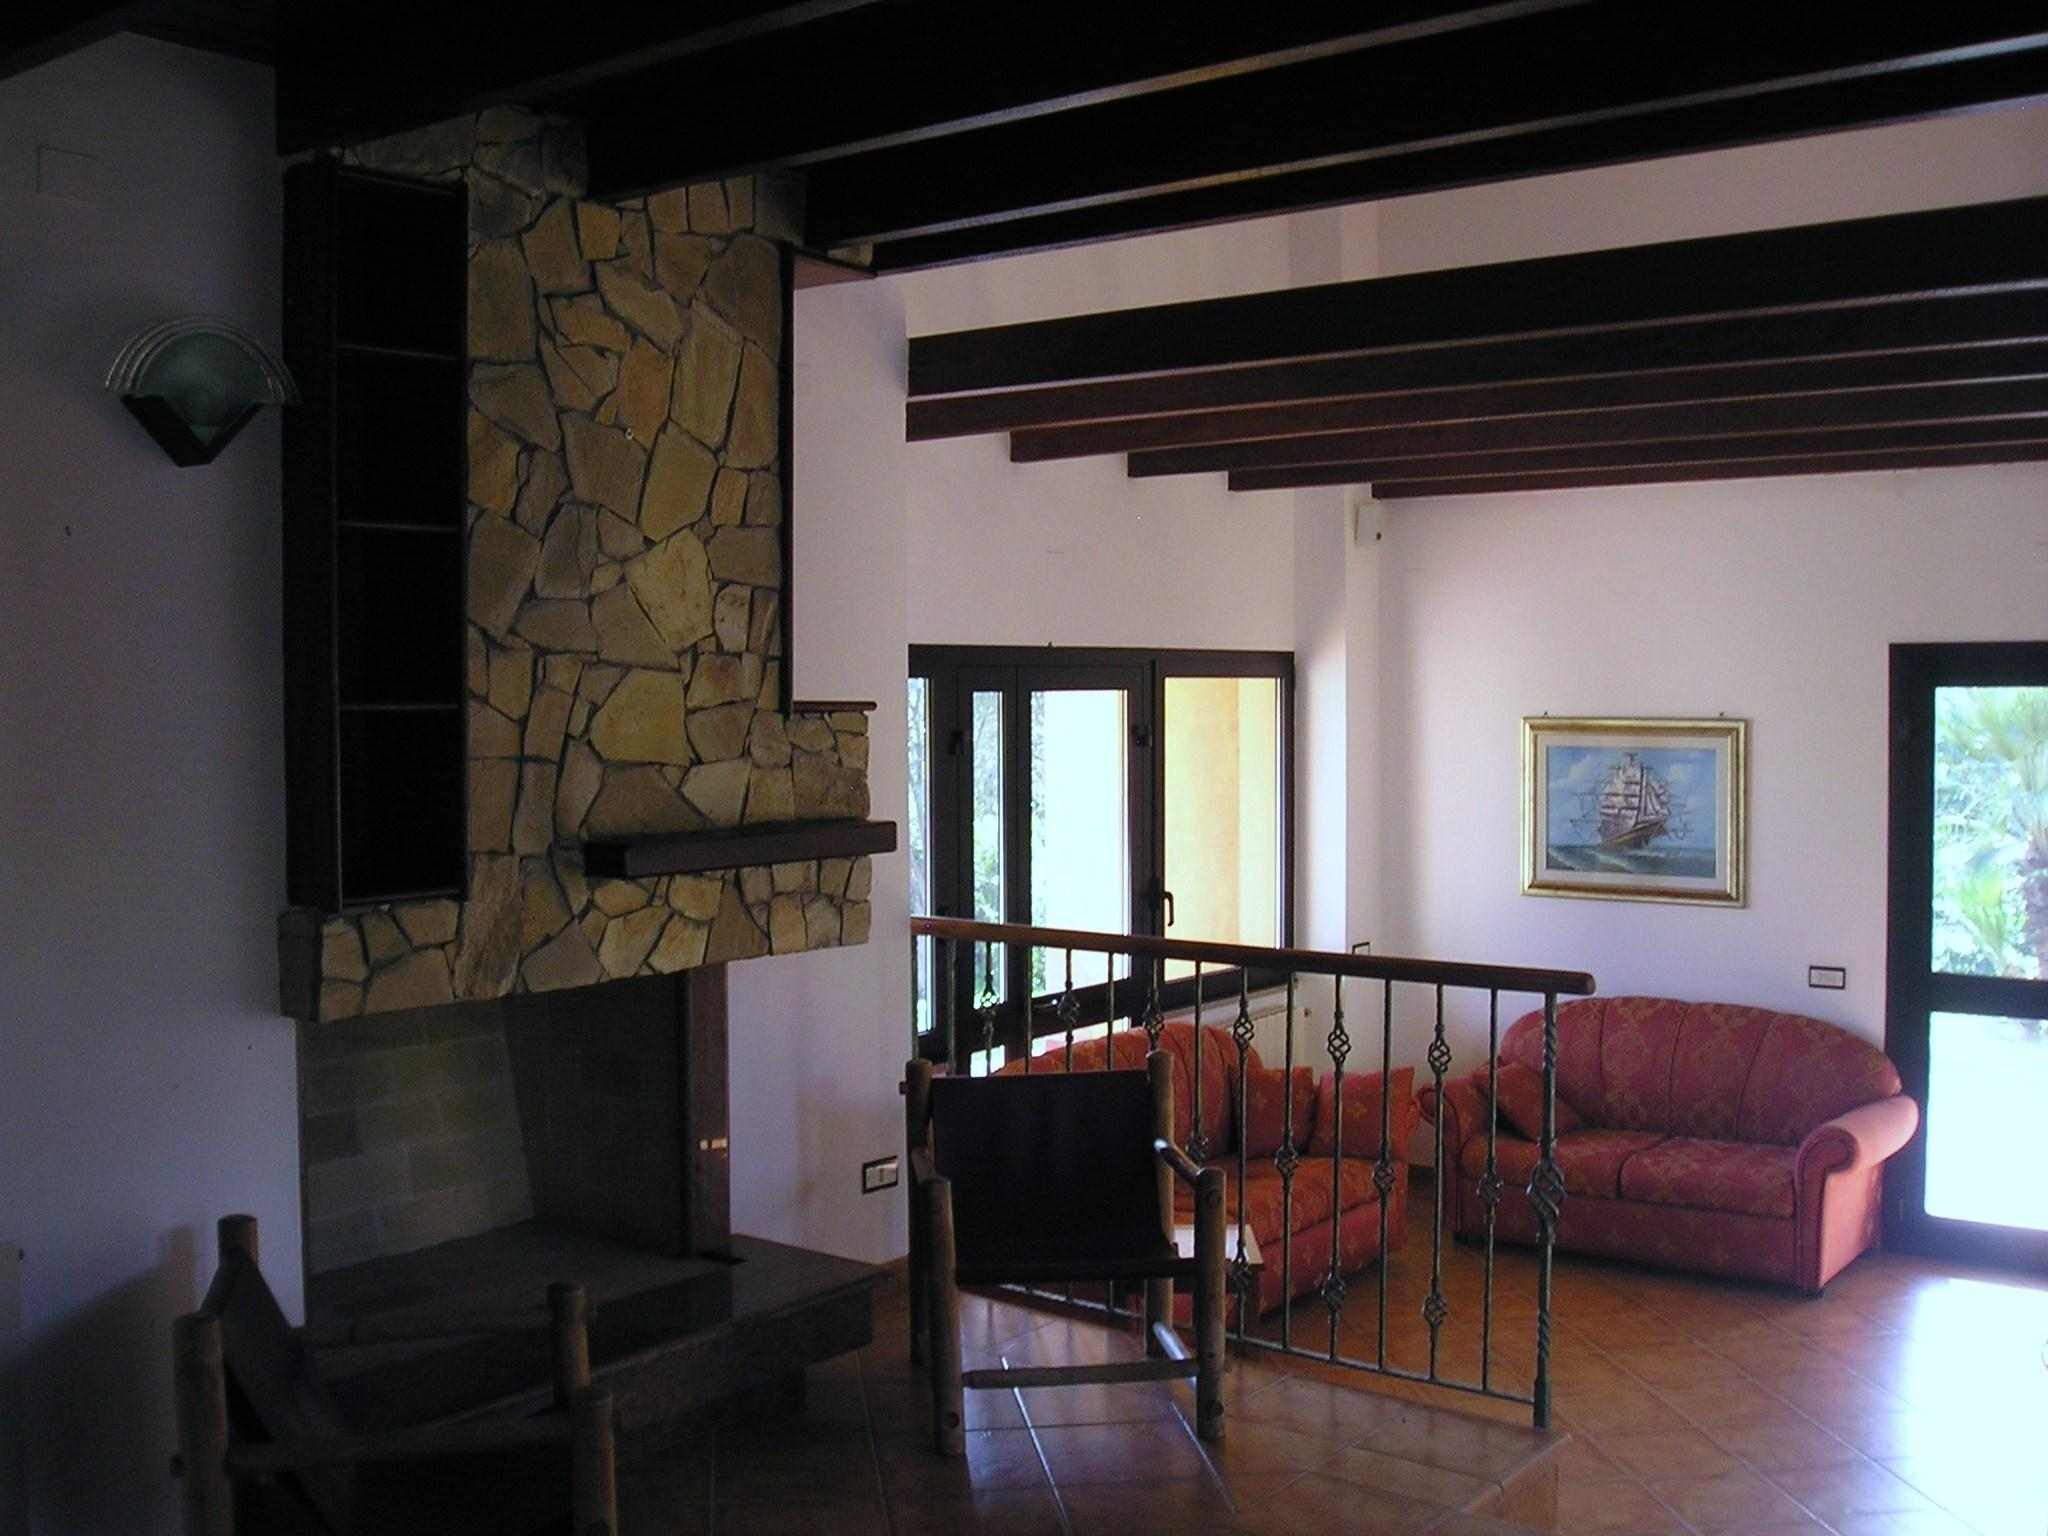 Вилла Уливи 3 Резиденция Из Молас, Пула Юг Сардинии